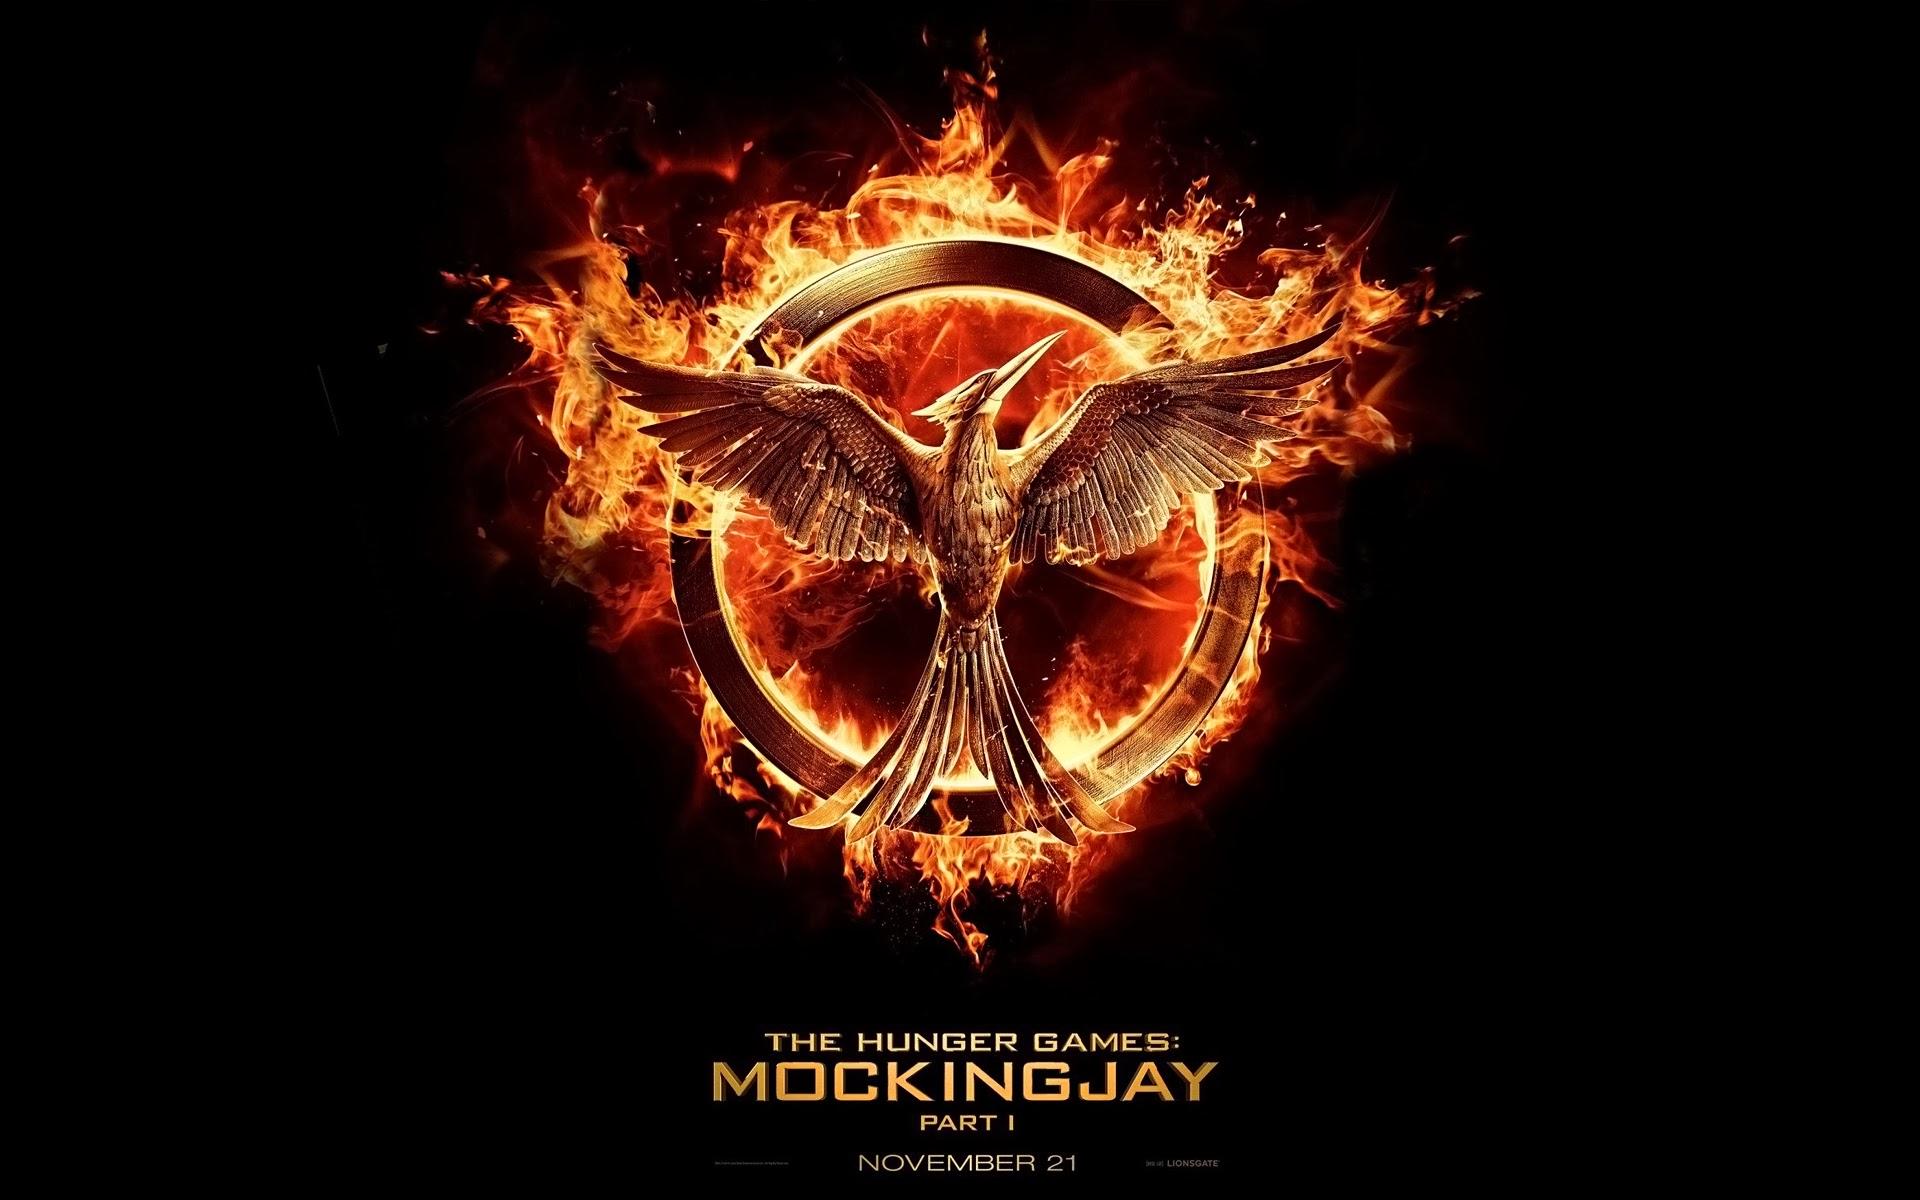 The Hunger Games Mockingjay Part 1 Wallpaper 1920x1200